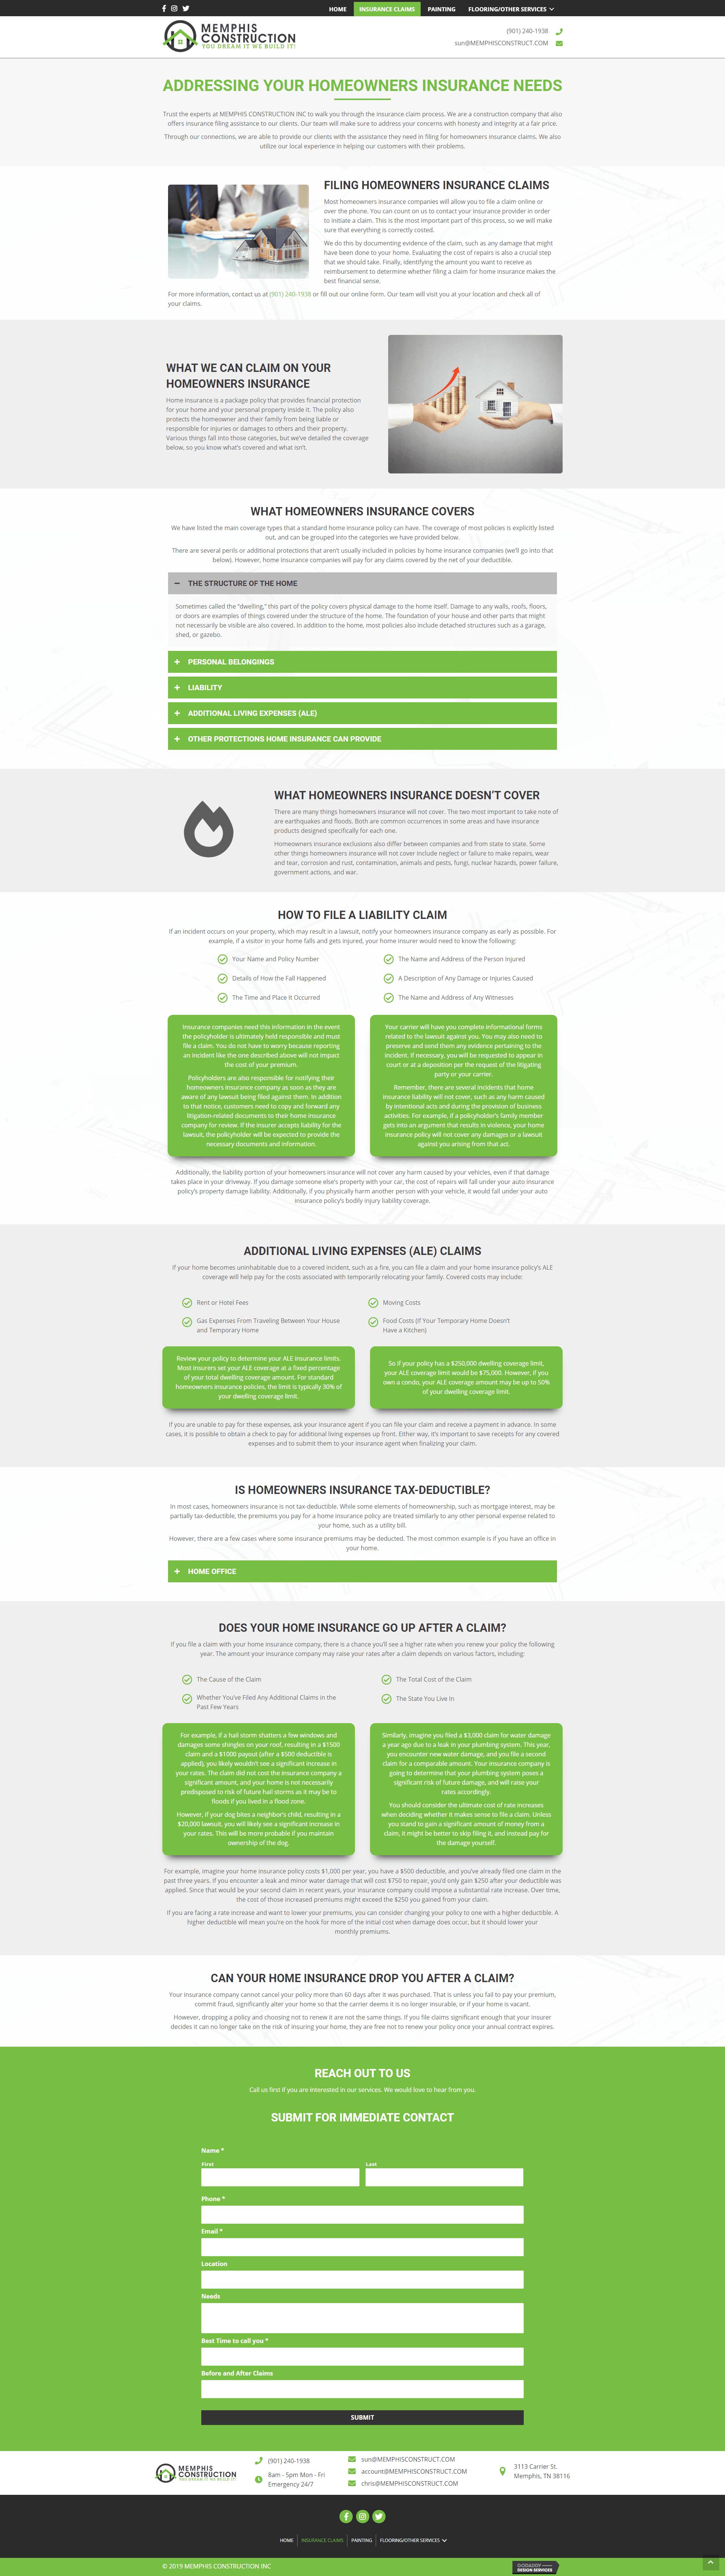 screencapture-pxu-ebe-myftpupload-insurance-claims